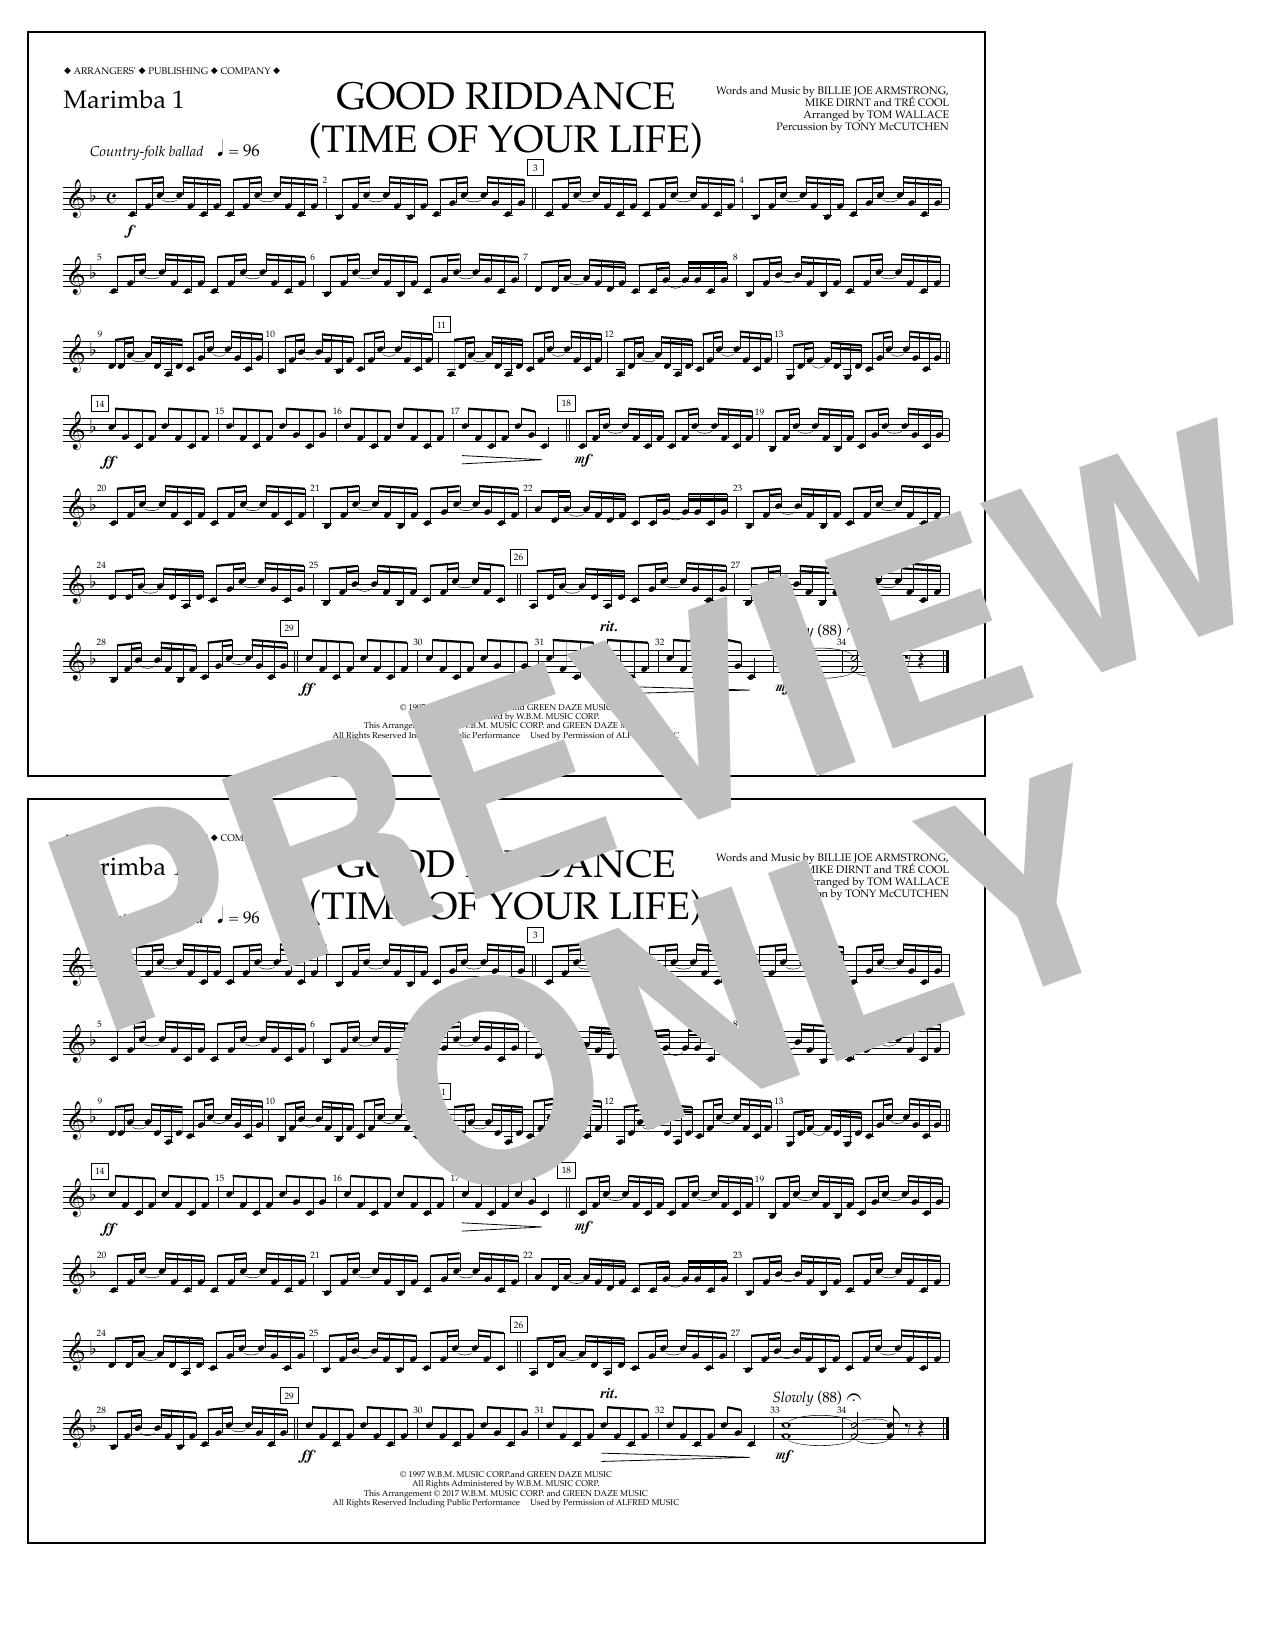 Good Riddance (Time of Your Life) - Marimba 1 Sheet Music